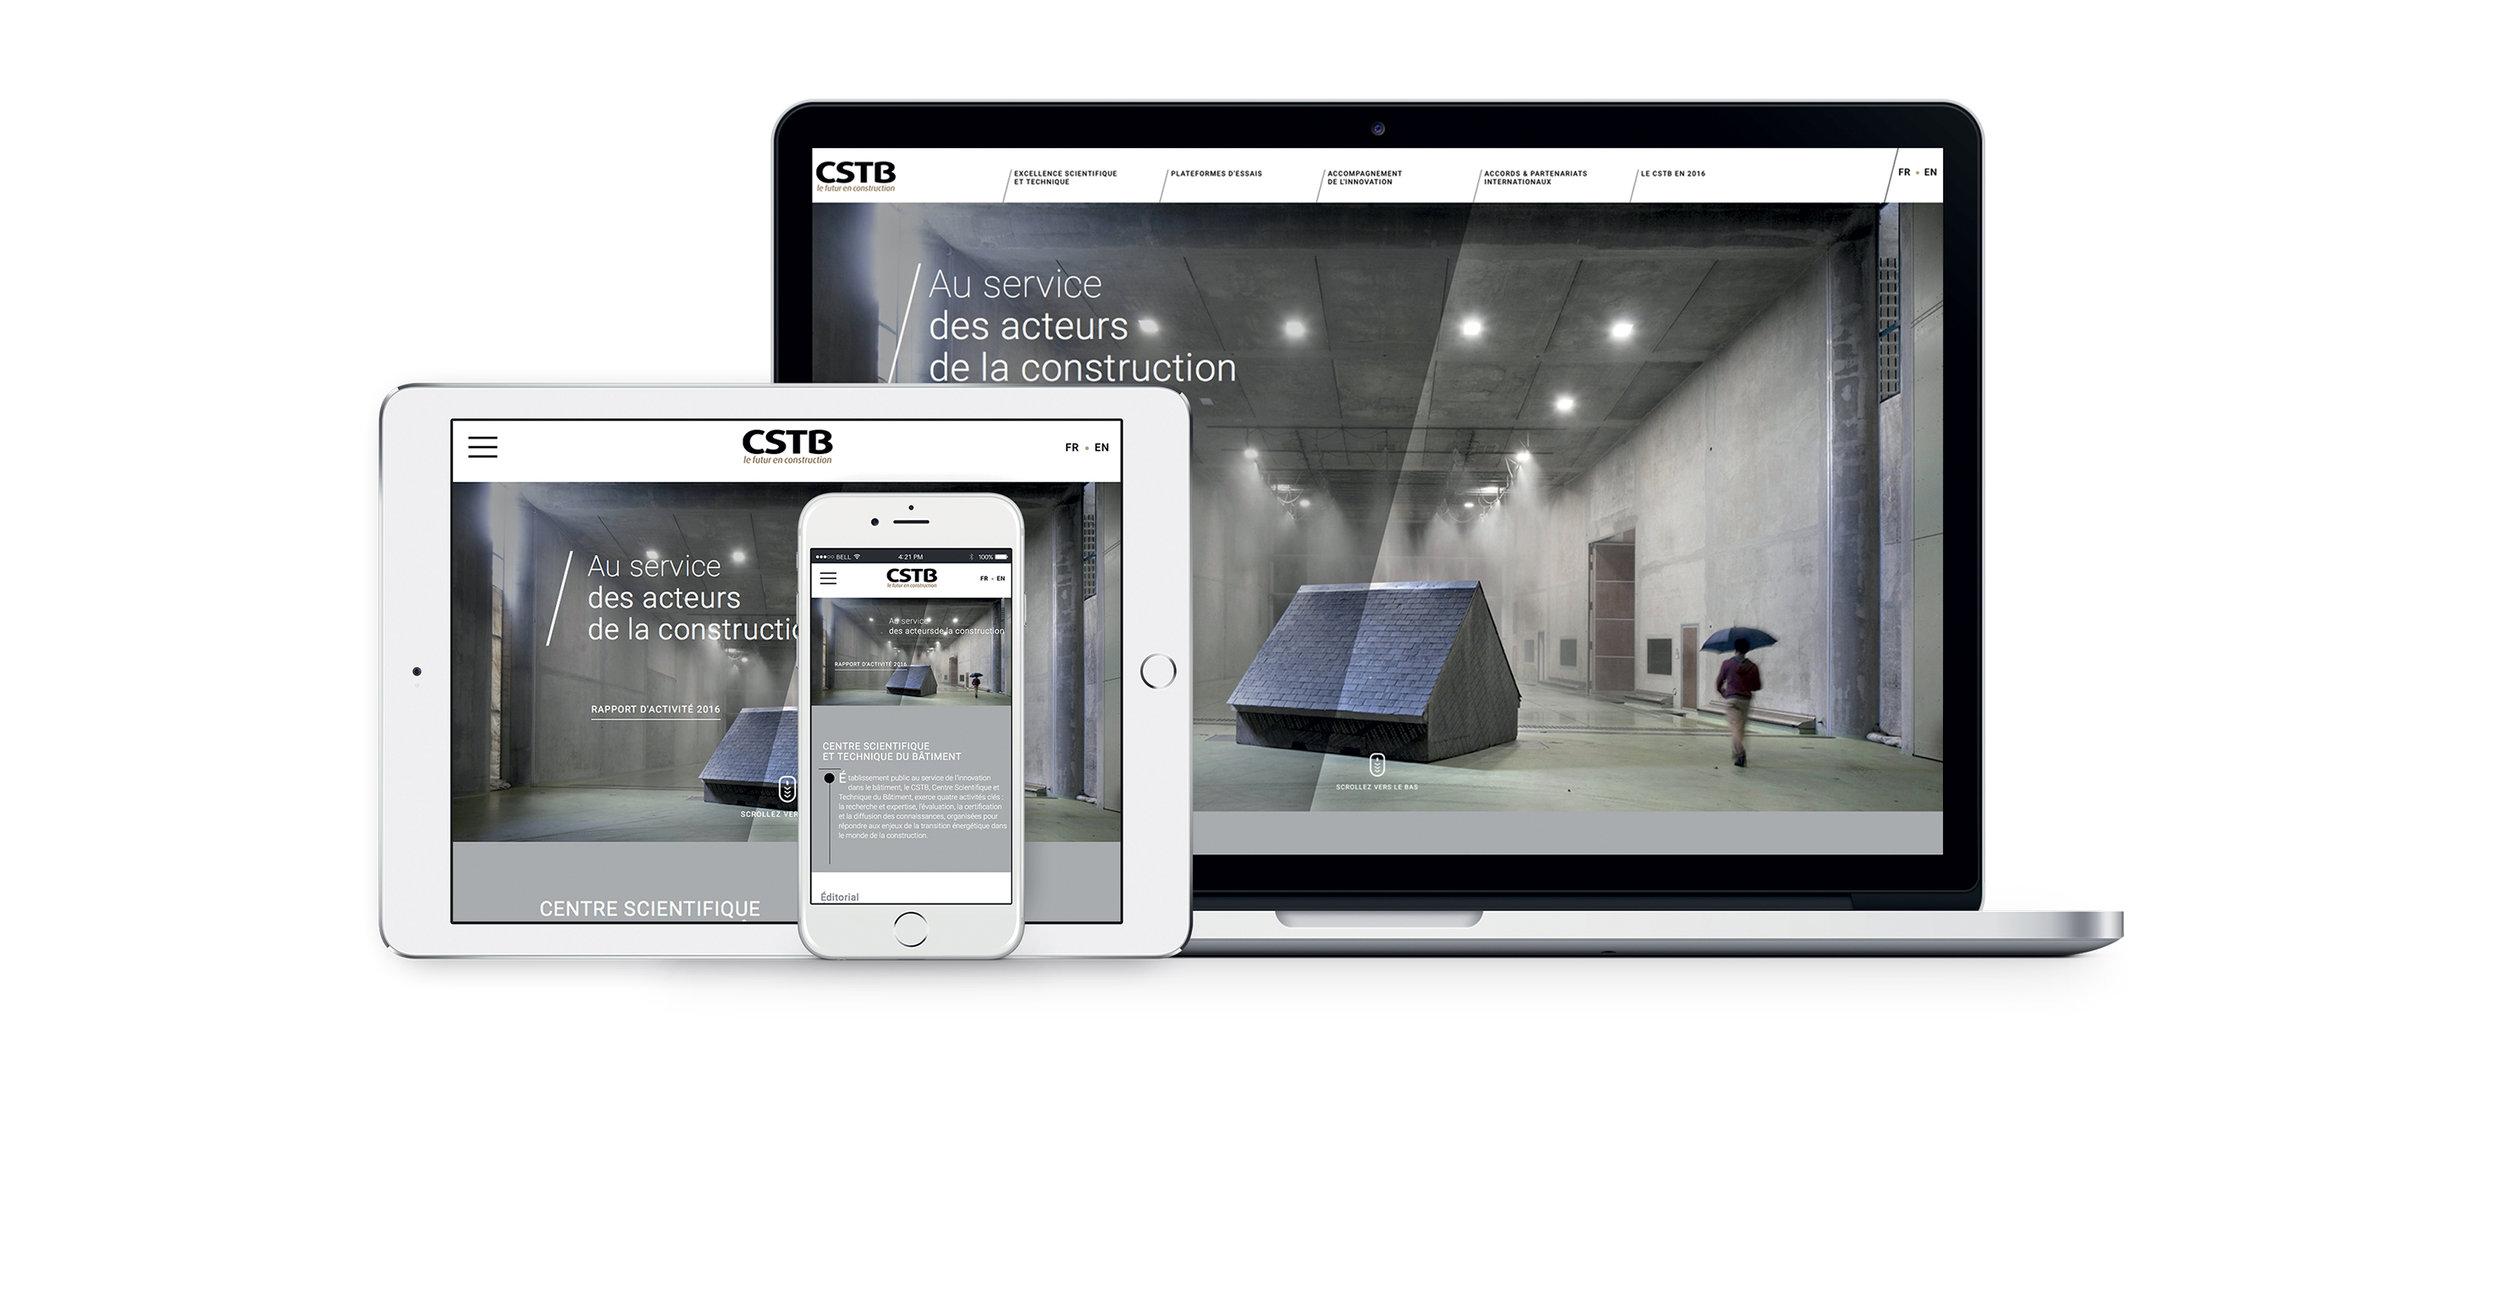 iMac-+-iPad-+-iPhone-CSTB.jpg